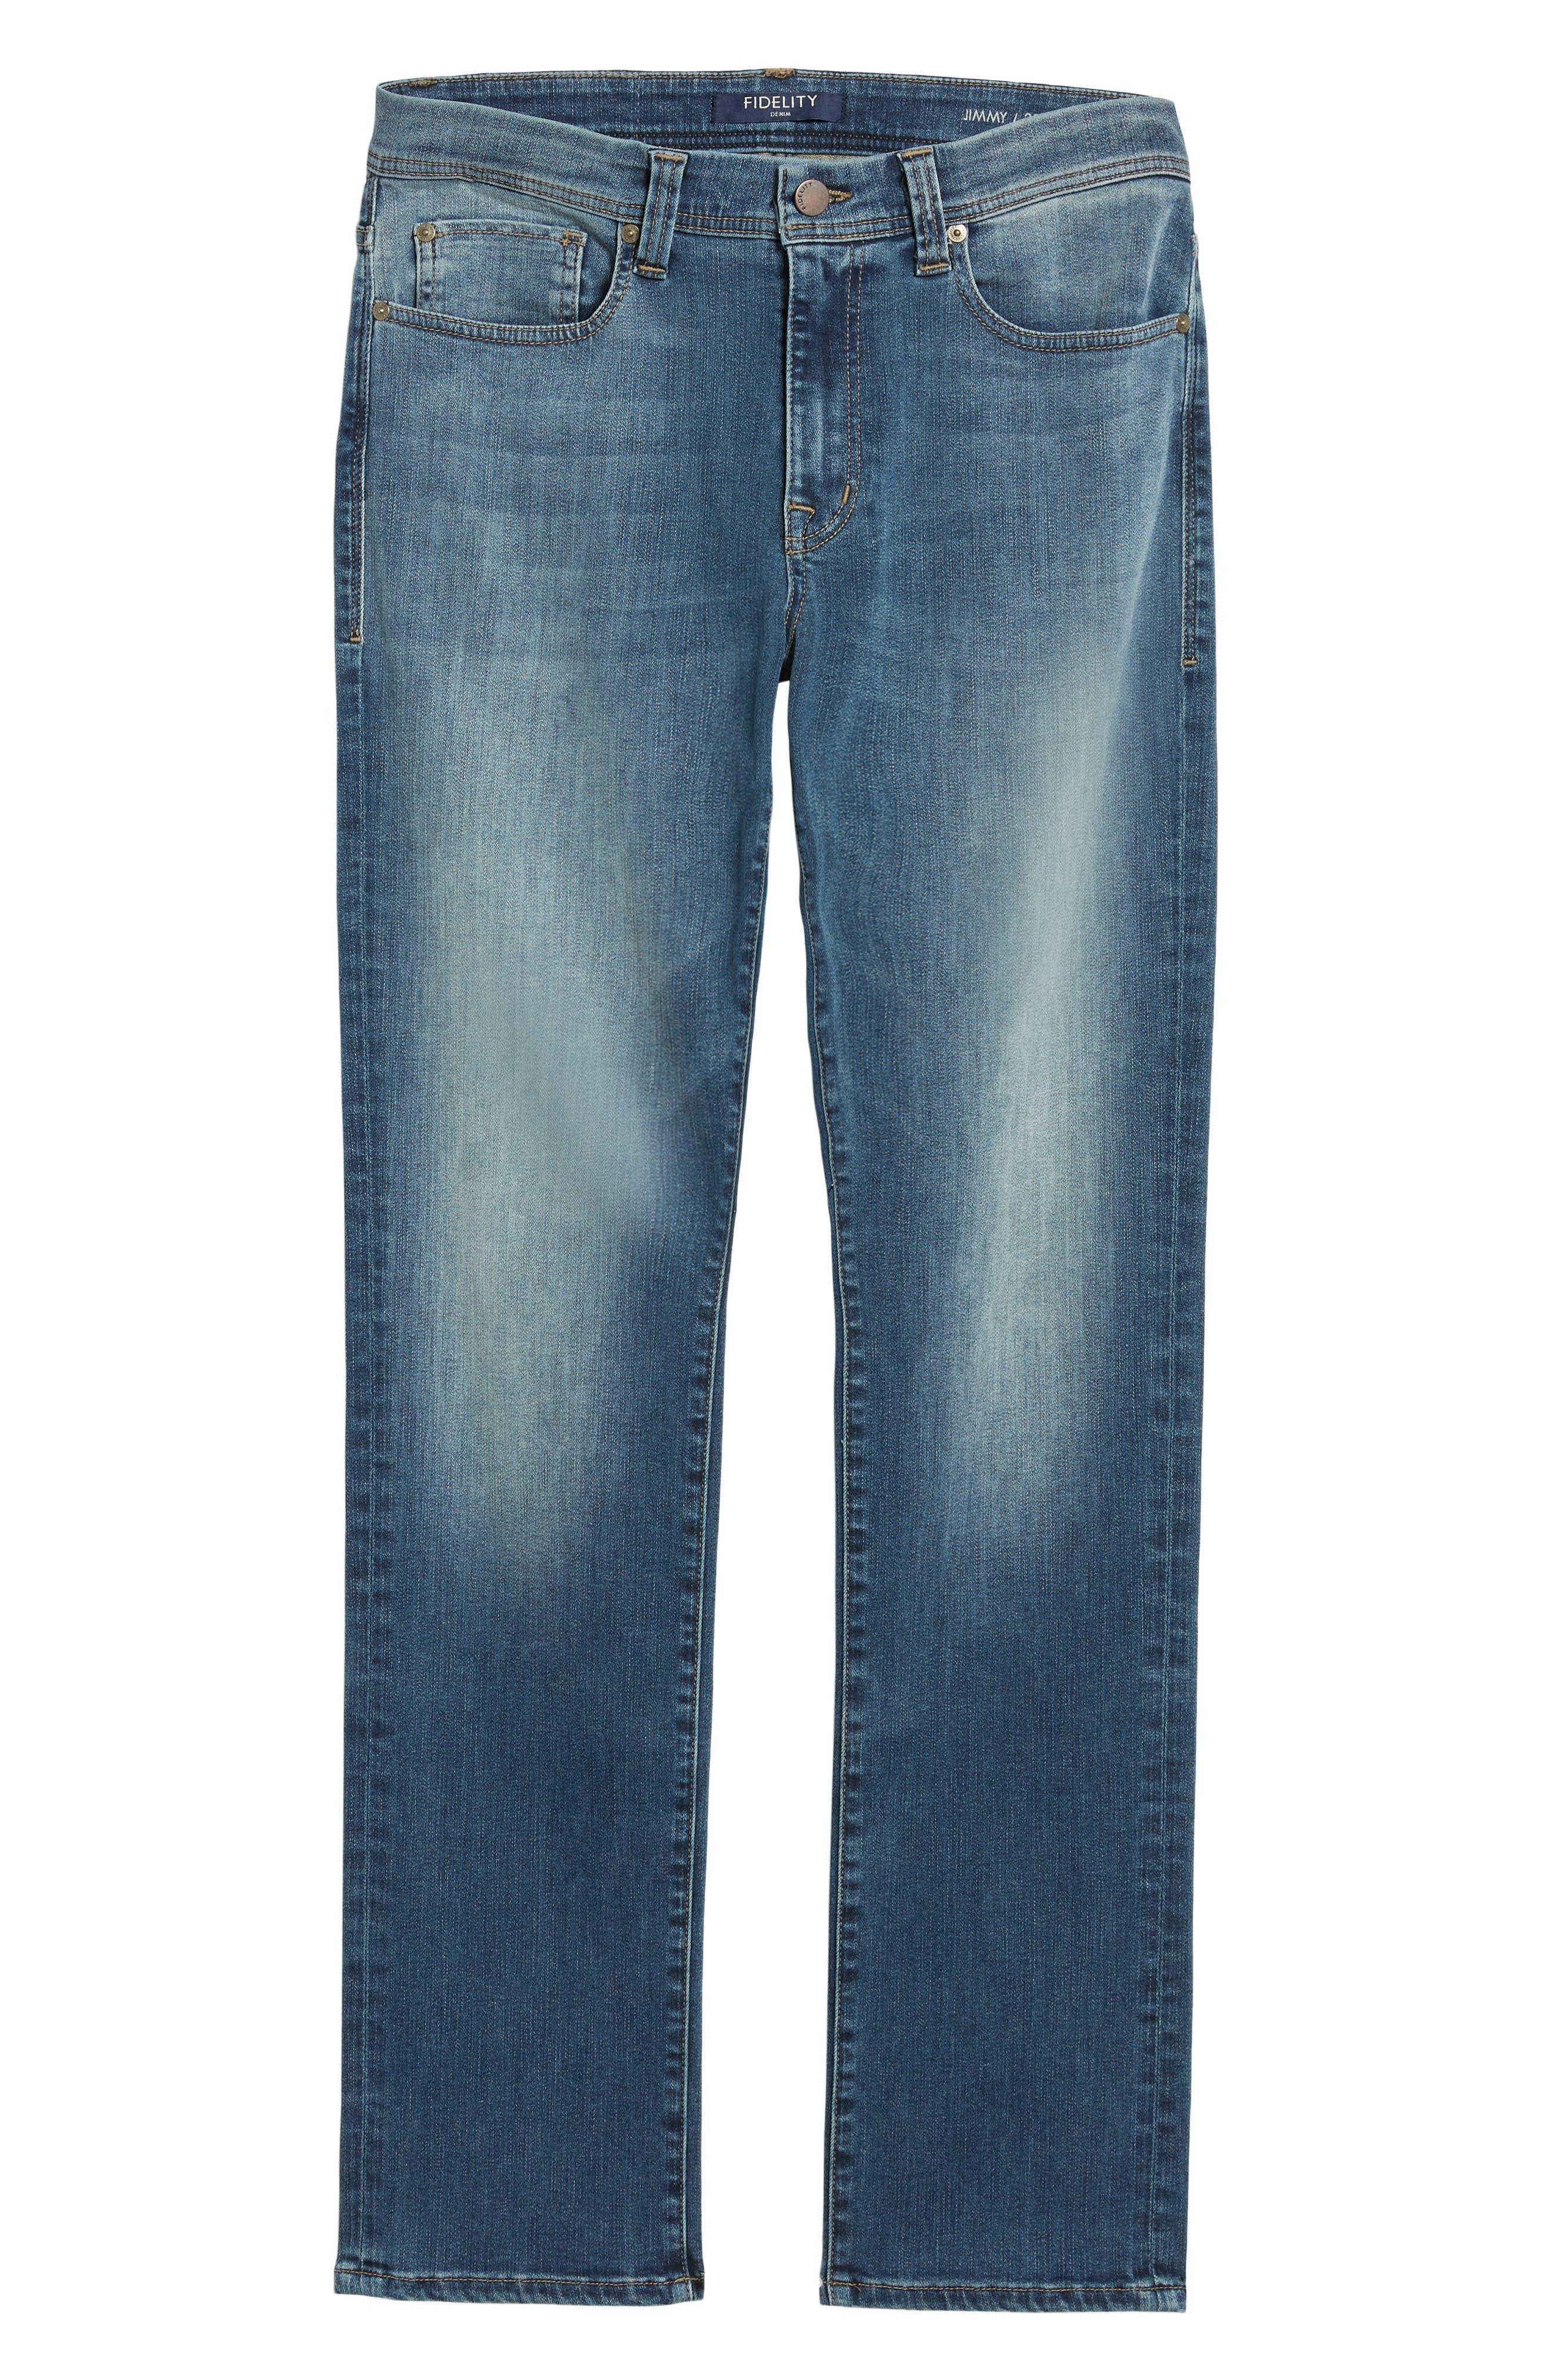 Jimmy Slim Straight Leg Jeans,                             Alternate thumbnail 6, color,                             FOSTER